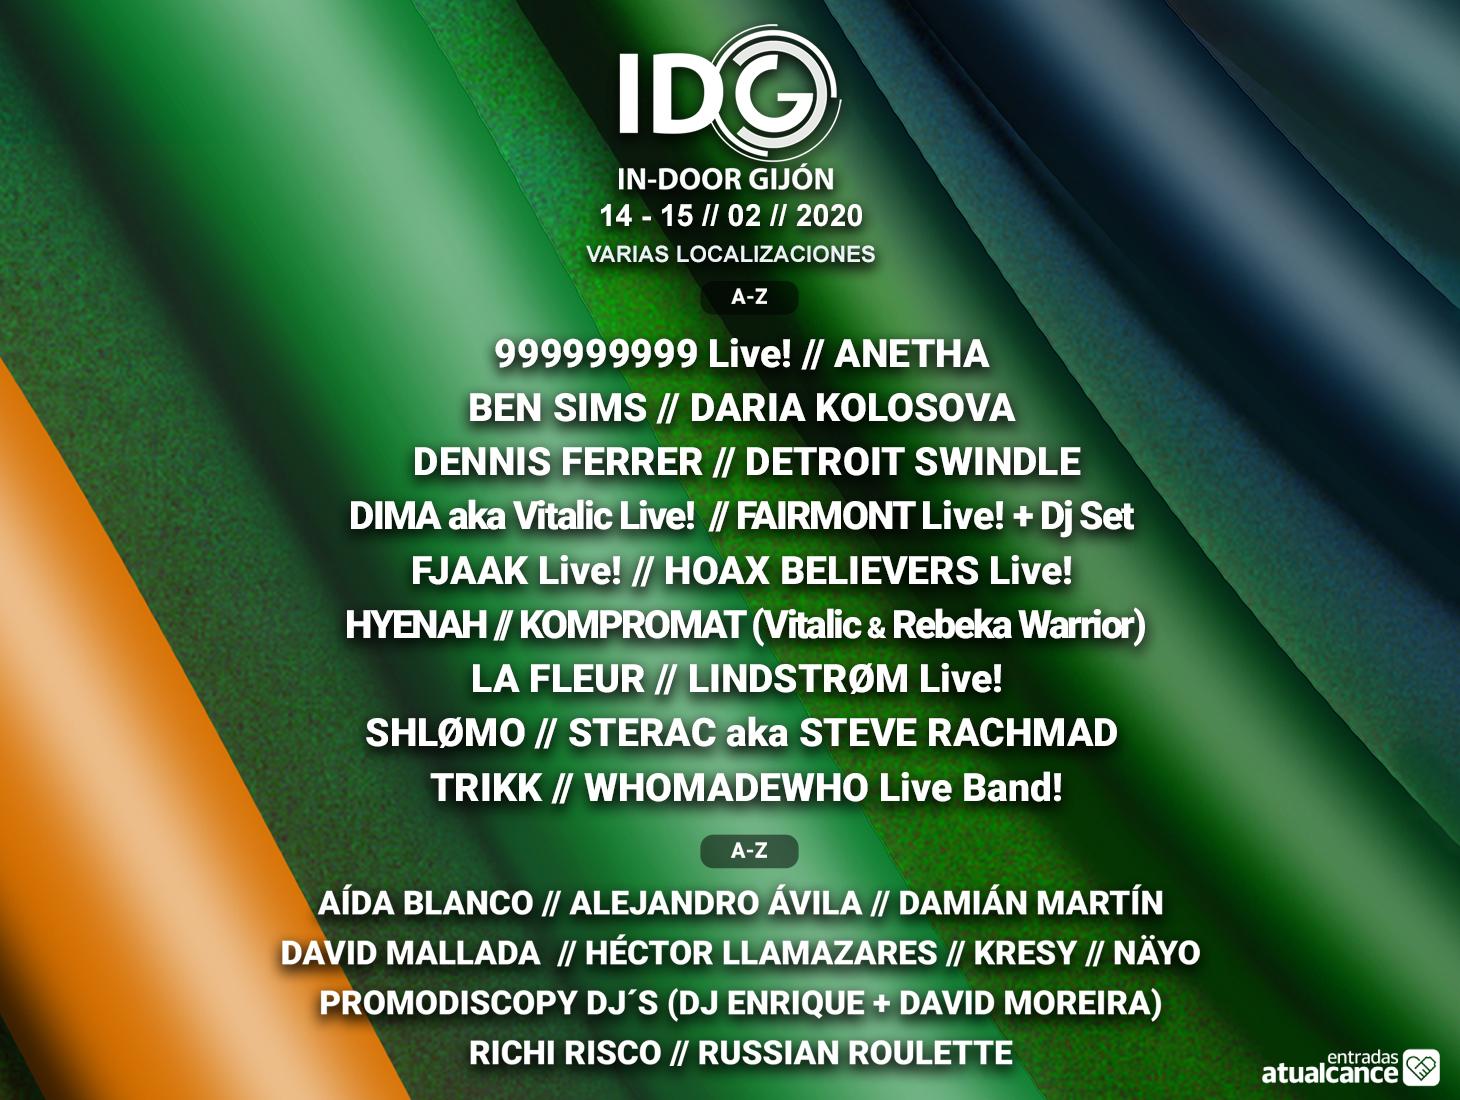 Bendita electrónica. - Página 3 Indoor-gijon-festival-2020-5dcd176c2ee0d